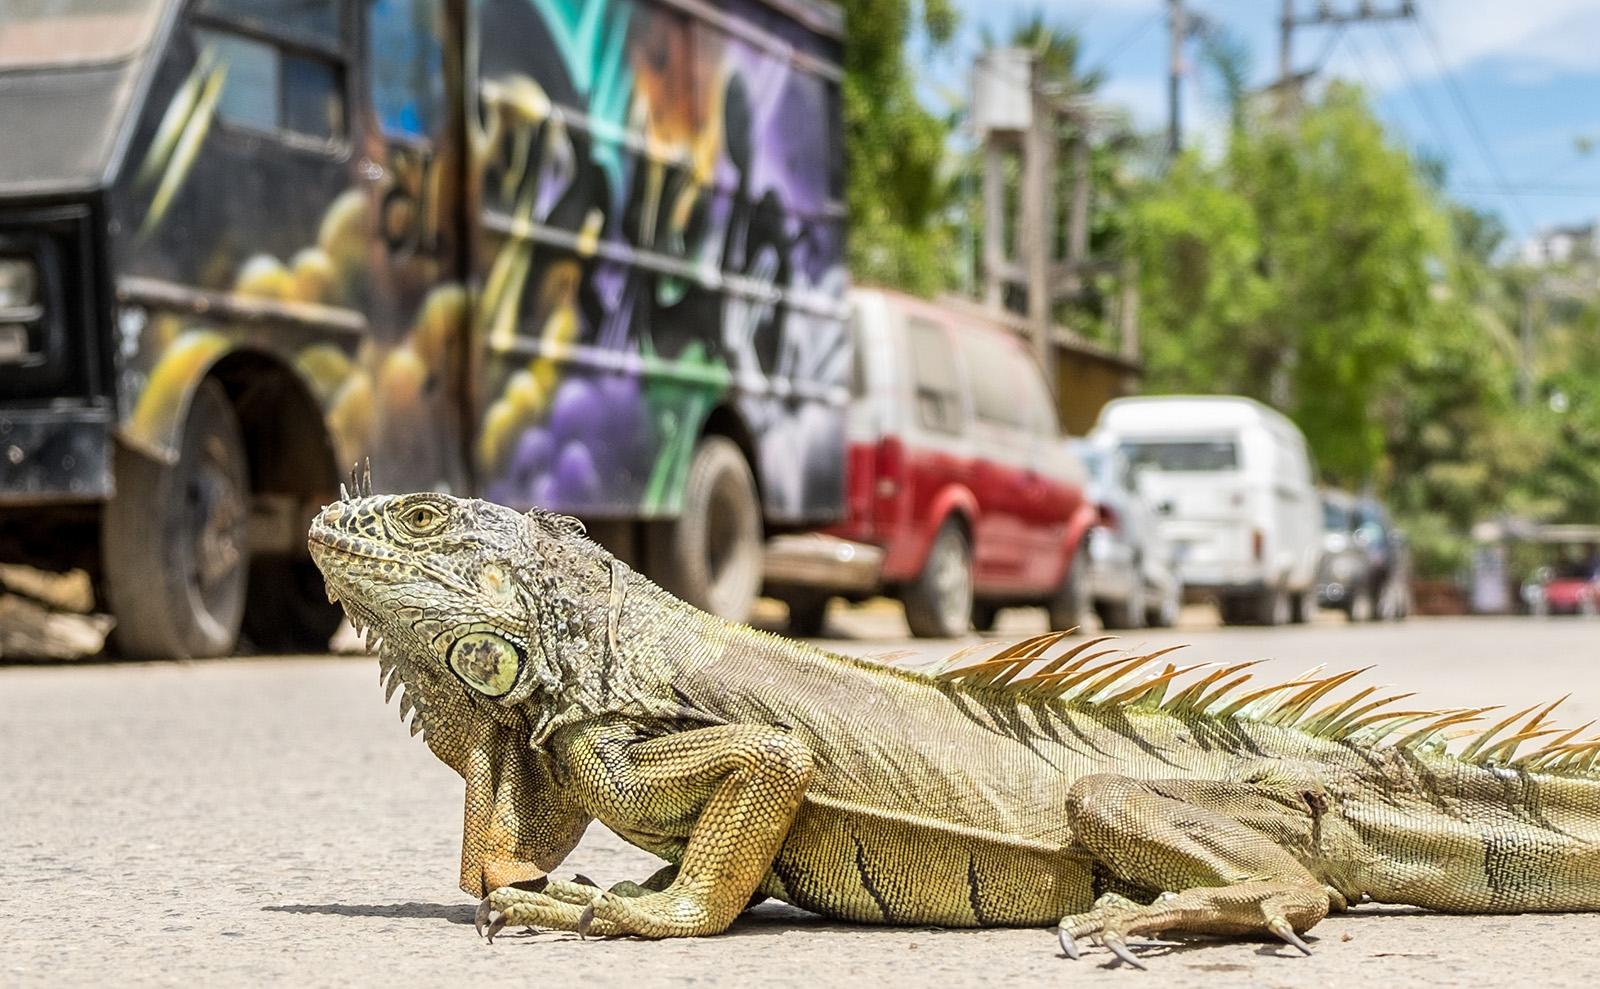 iguana on asphalt in Sayulita, Mexico